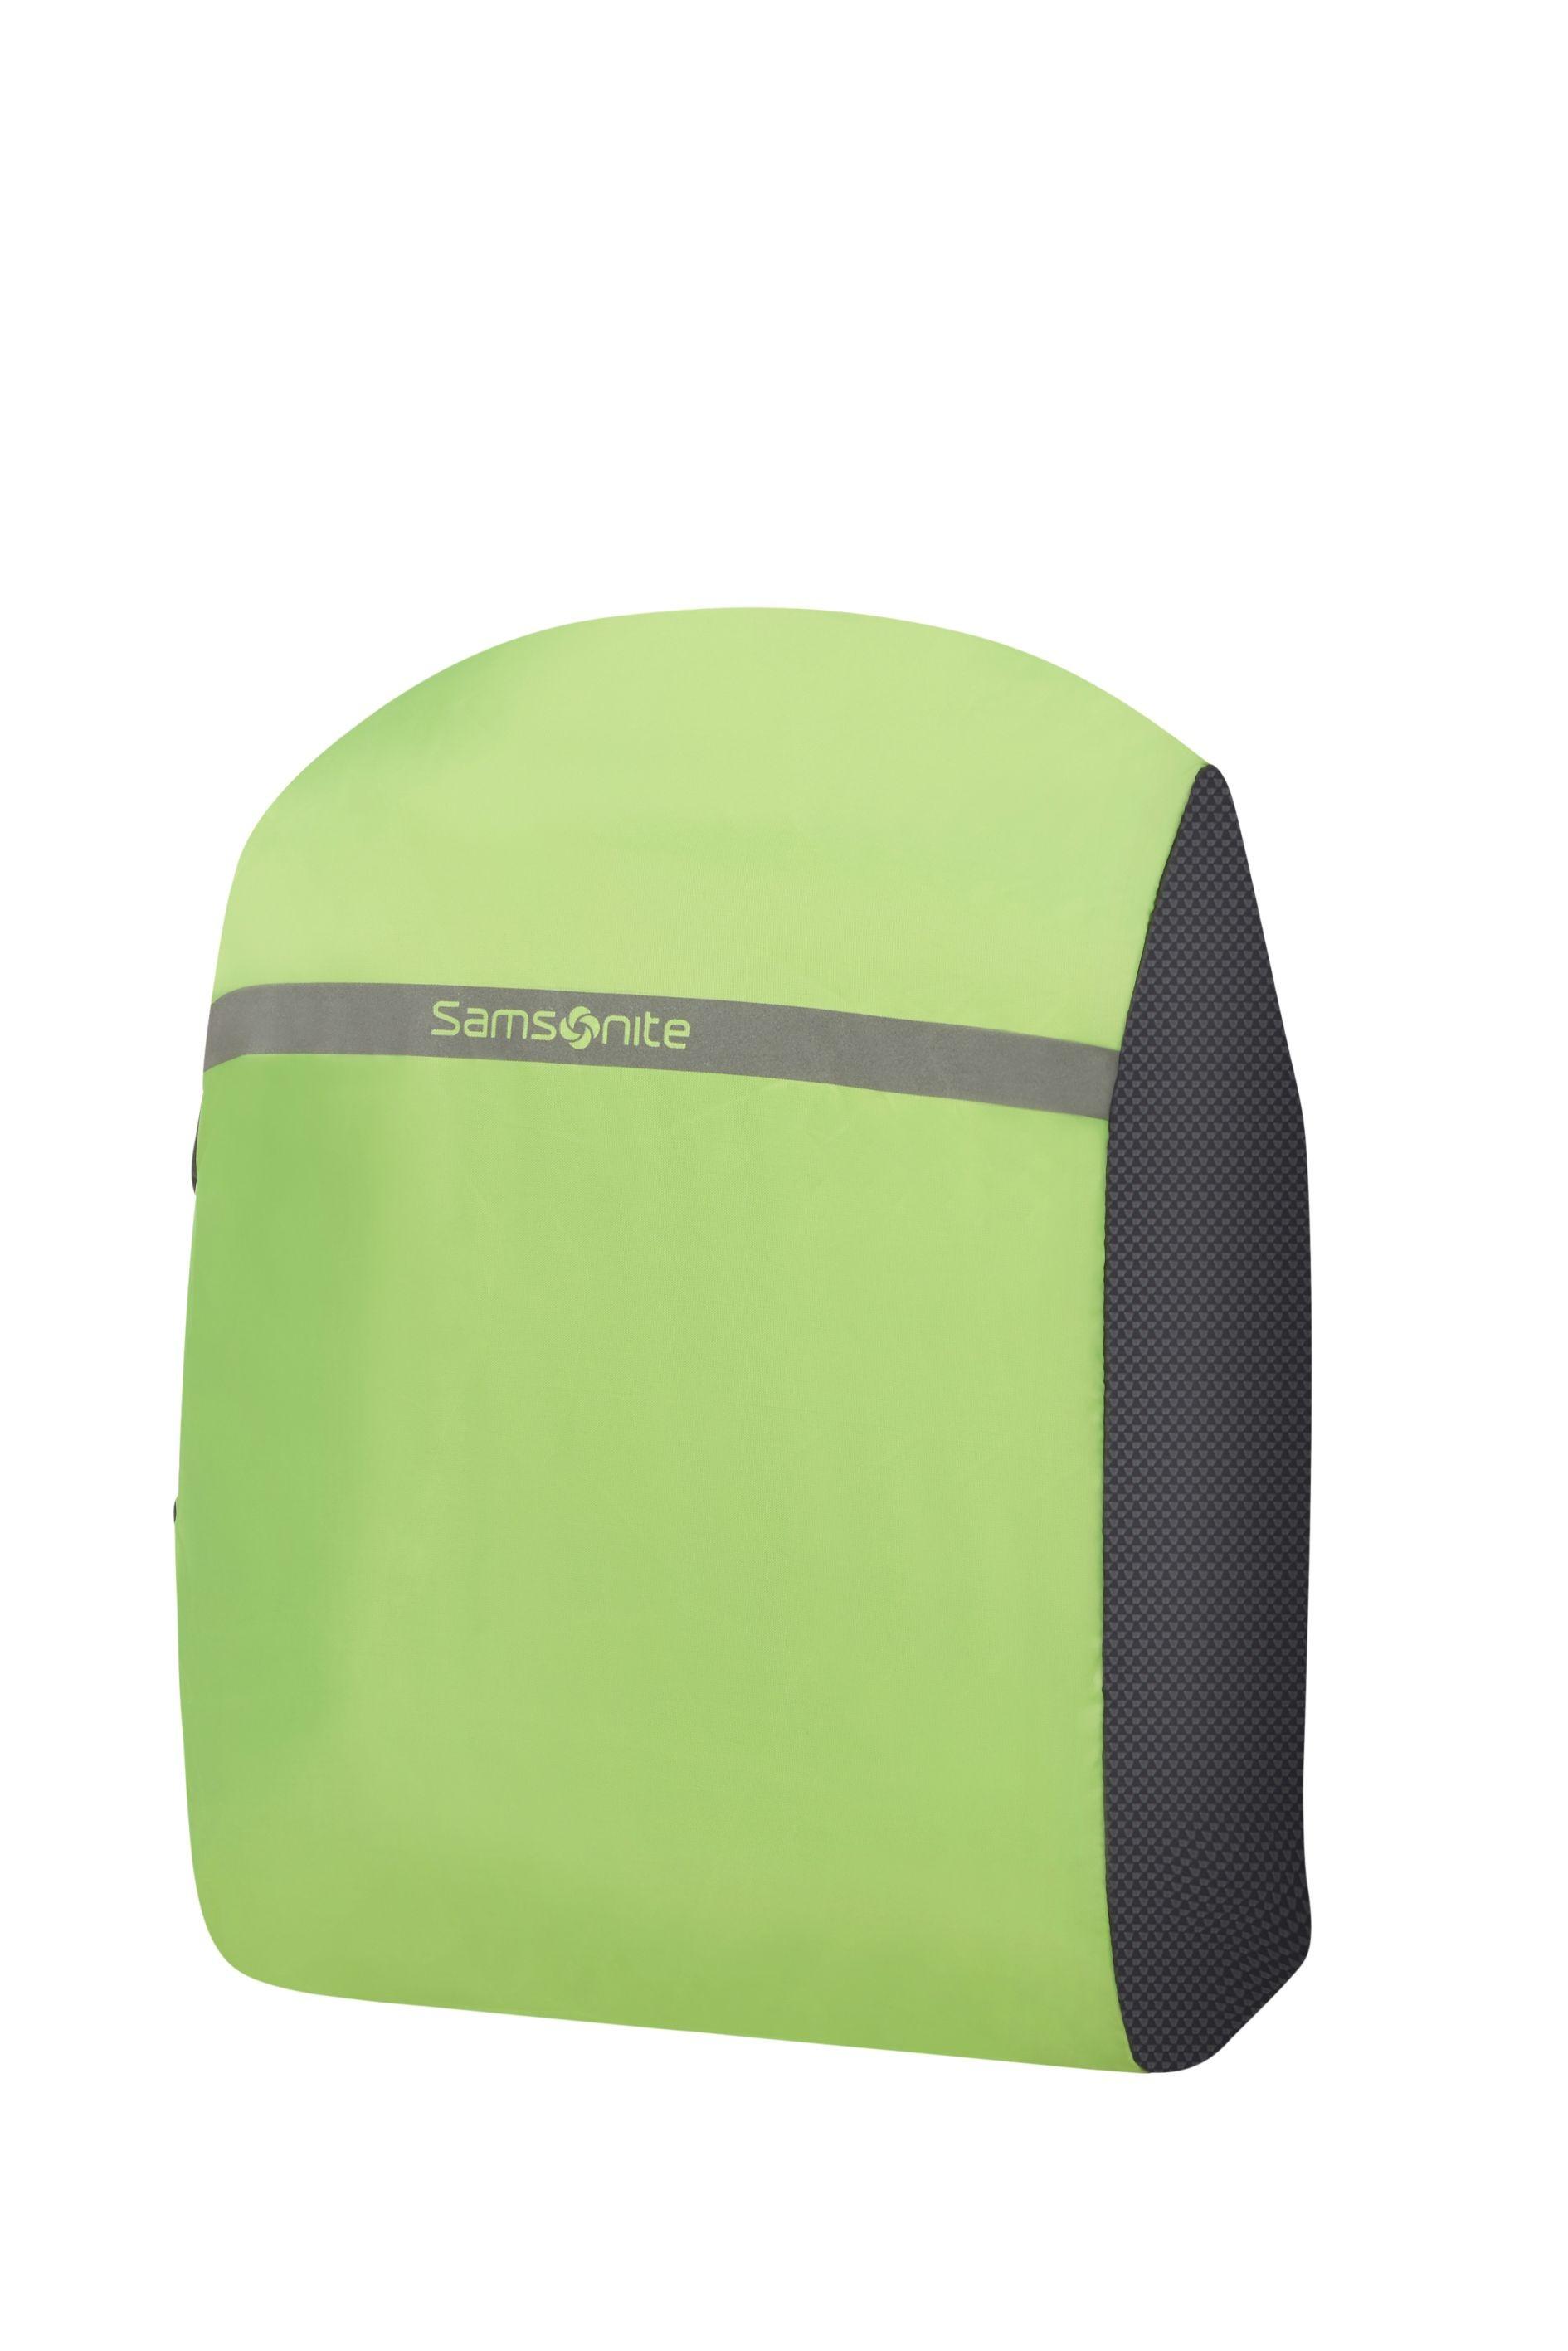 Samsonite Sonora Laptop Backpack M, View 5